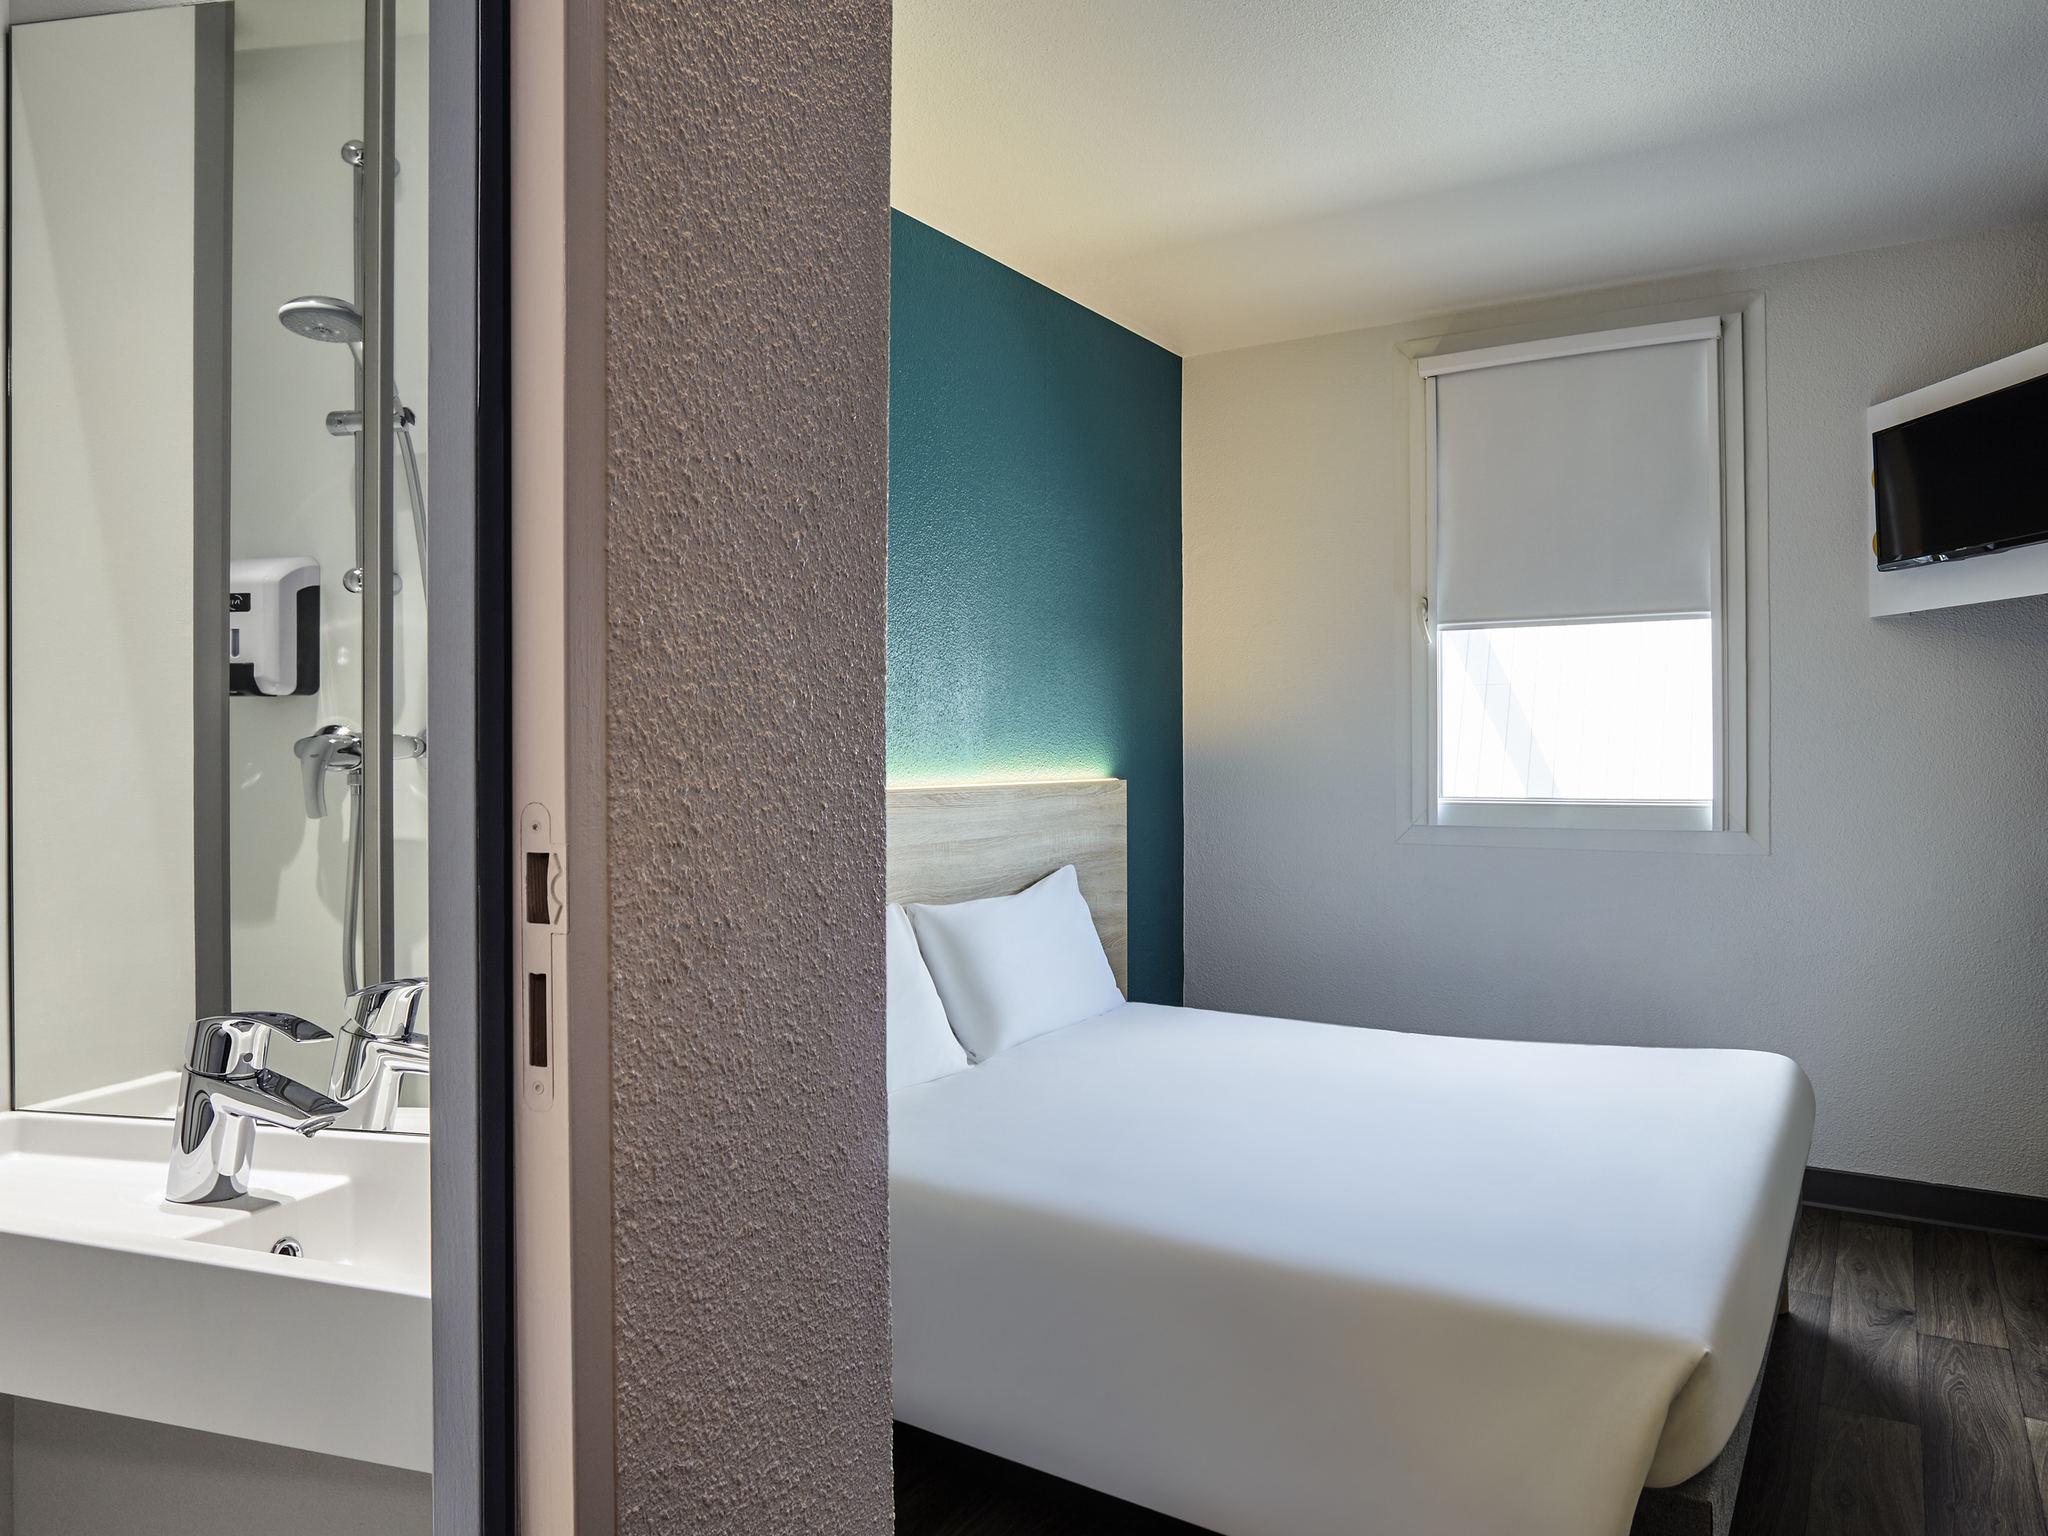 Отель — hotelF1 Rouen Louviers Le Vaudreuil